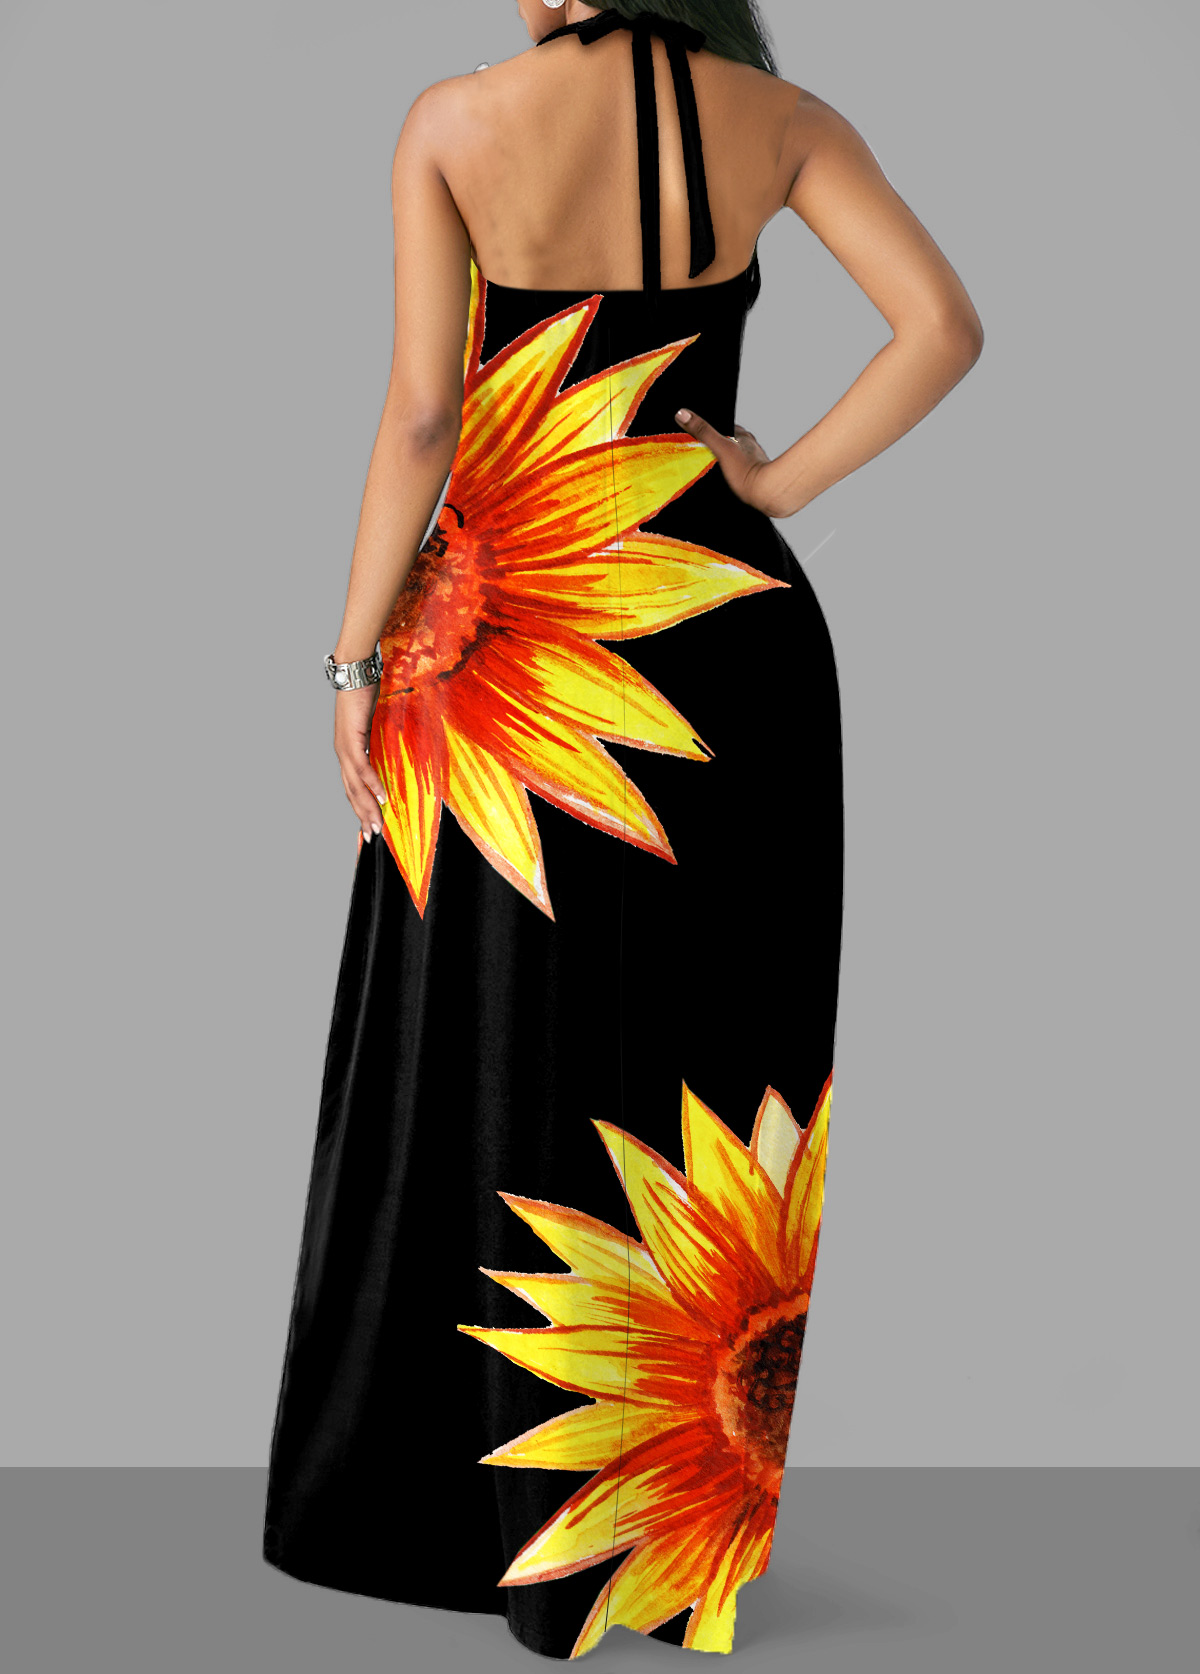 Halter Sunflower Print Cross Strap Dress